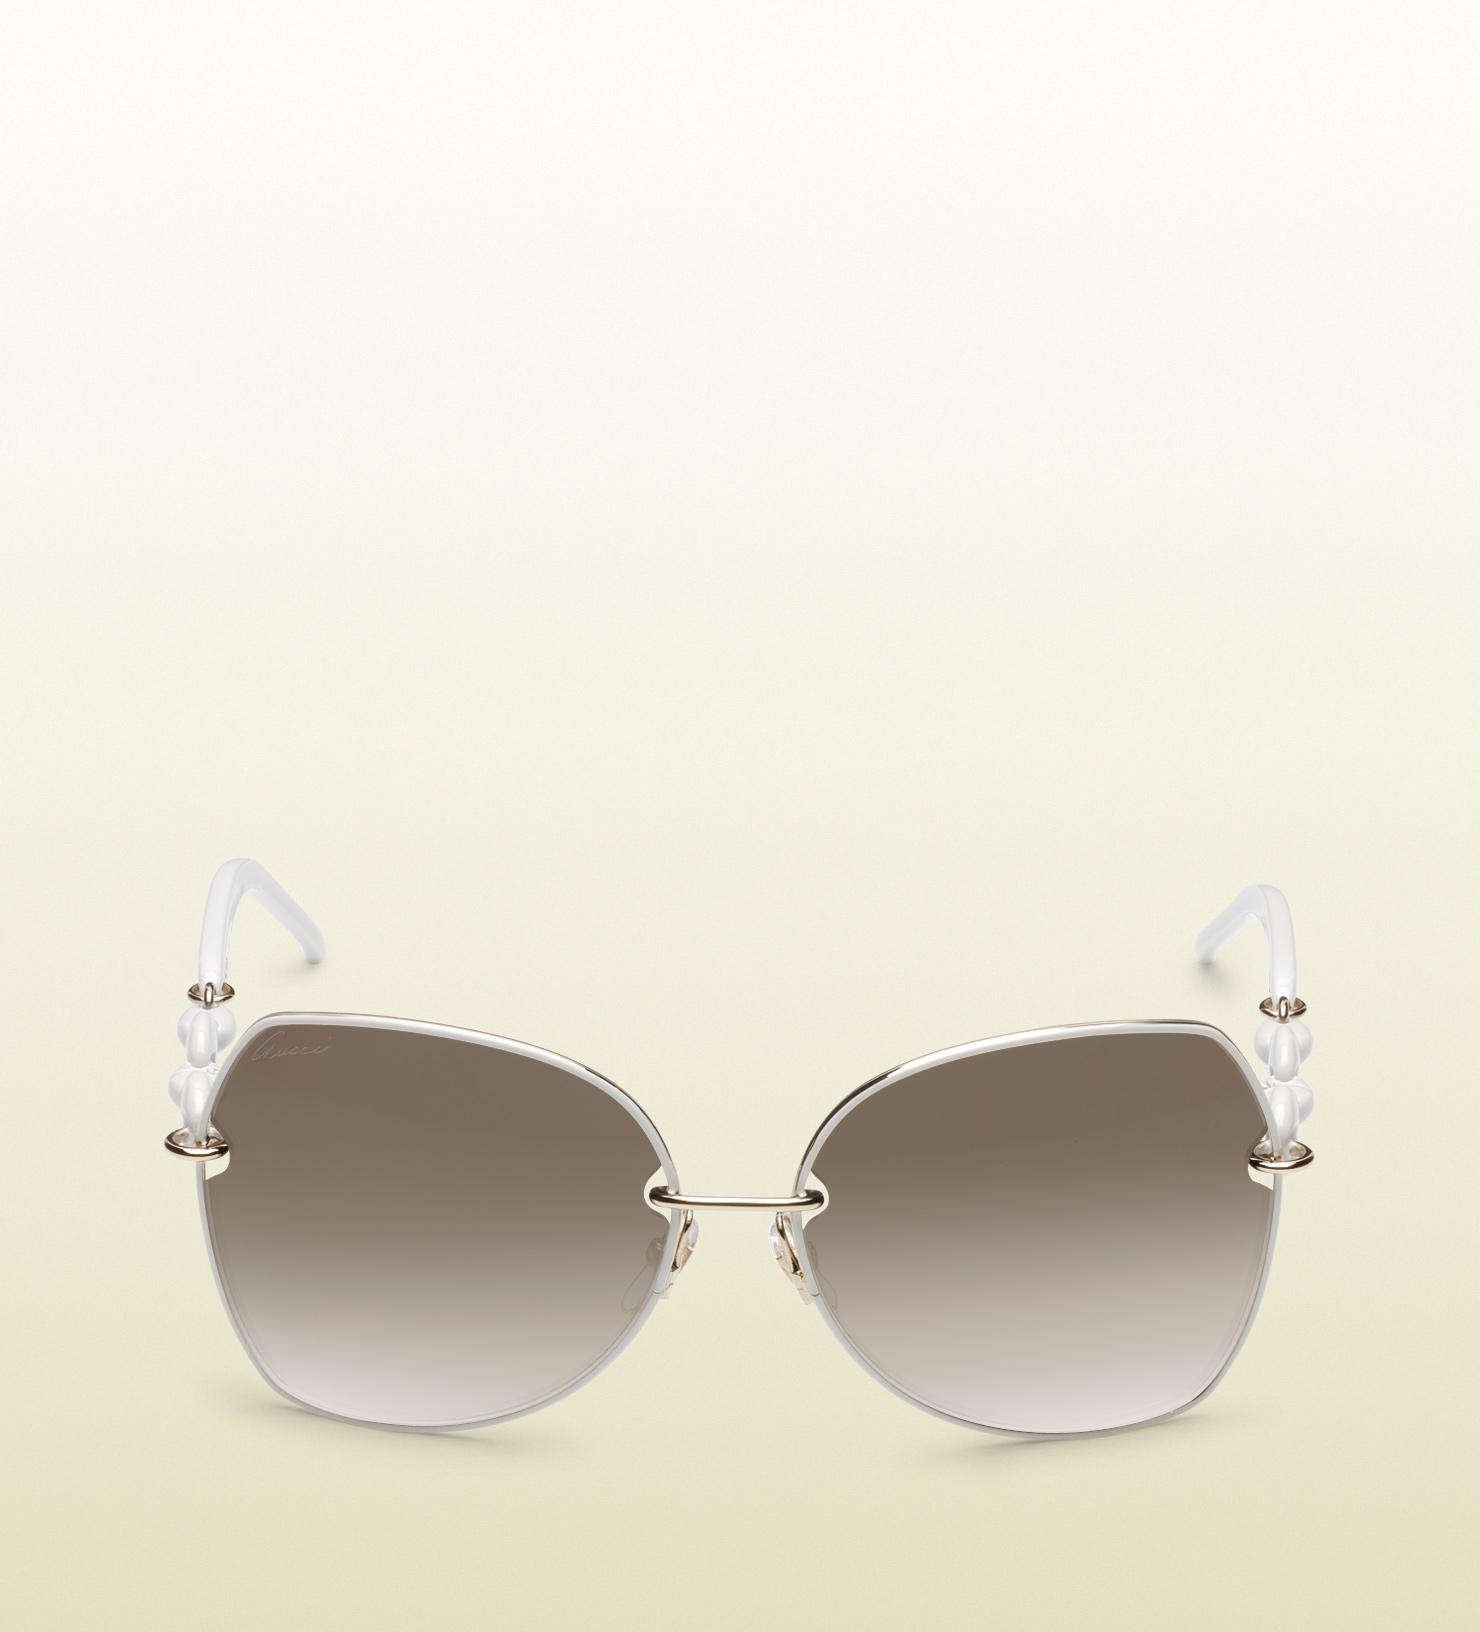 aeb1545f0c2 Lyst - Gucci Medium Oval Frame Sunglasses with Plastic Marina Chain ...